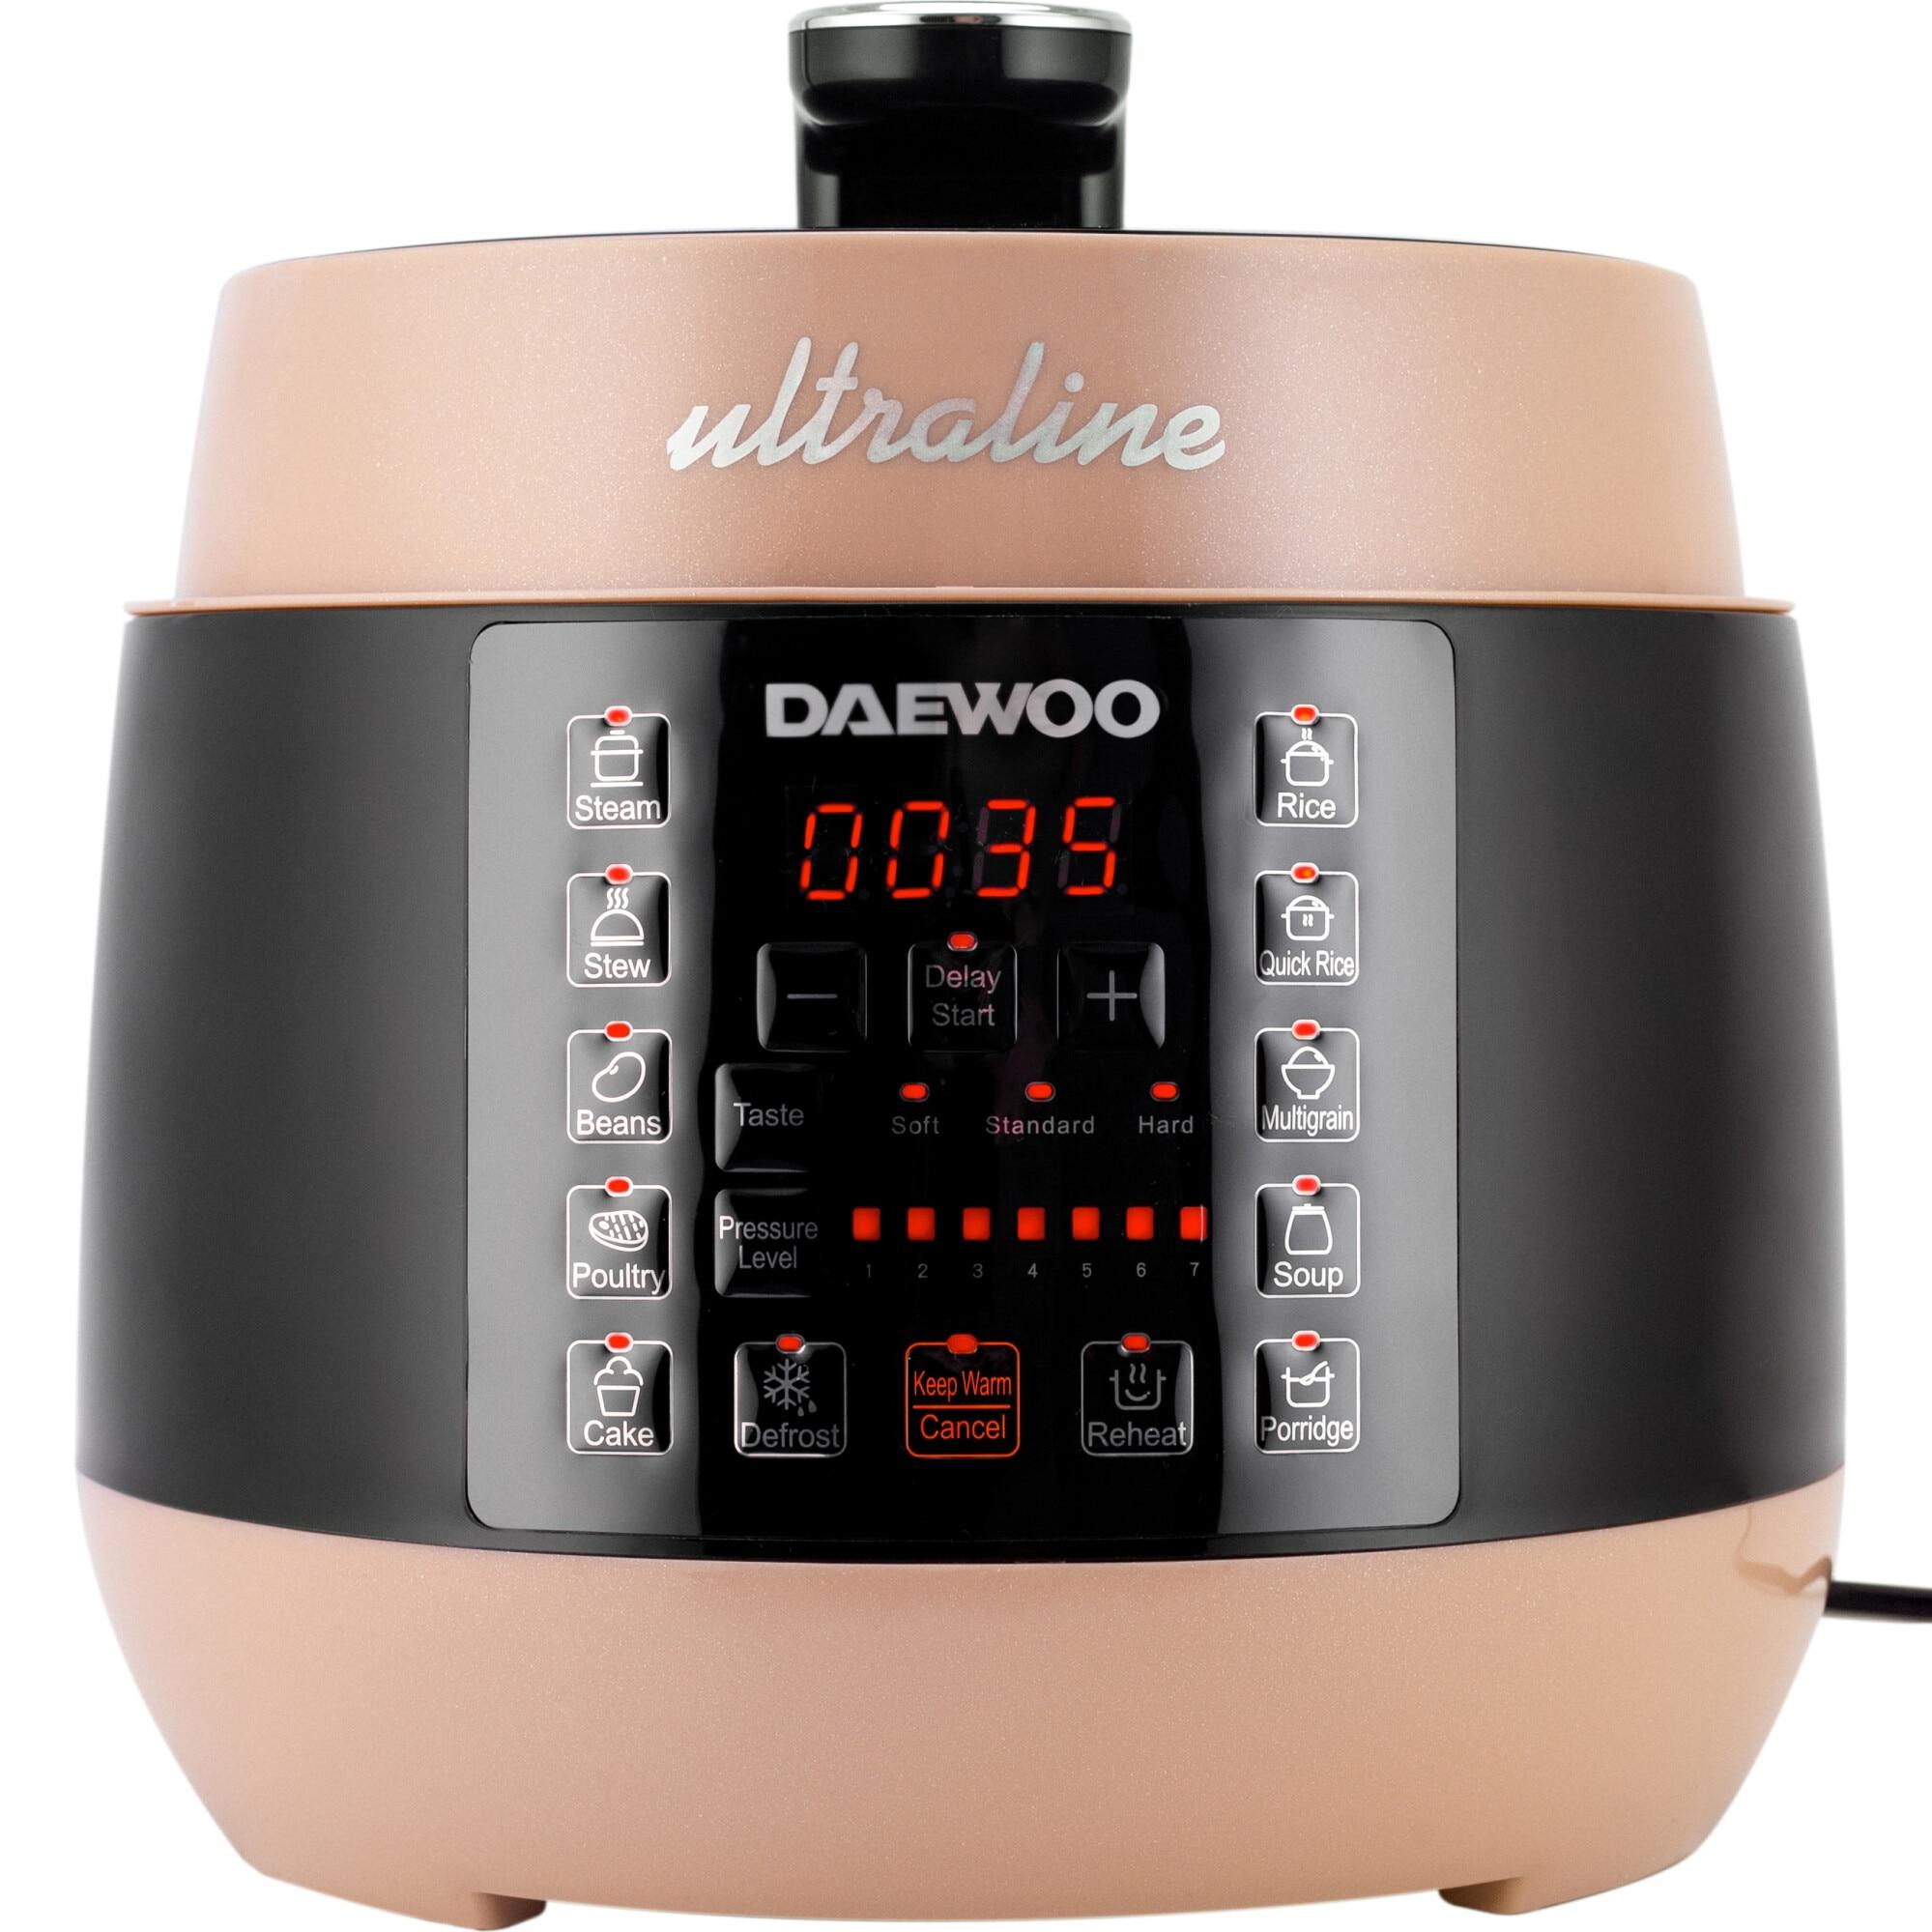 Fotografie Multicooker sub presiune Daewoo Ultraline, 900 W, capacitate 5 litri, 7 niveluri de presiune, 10 programe de gatire, start intarziat, functie decongelare, reincalzire, mentinerea caldurii, recipient din otel inoxidabil, display LED, Crem